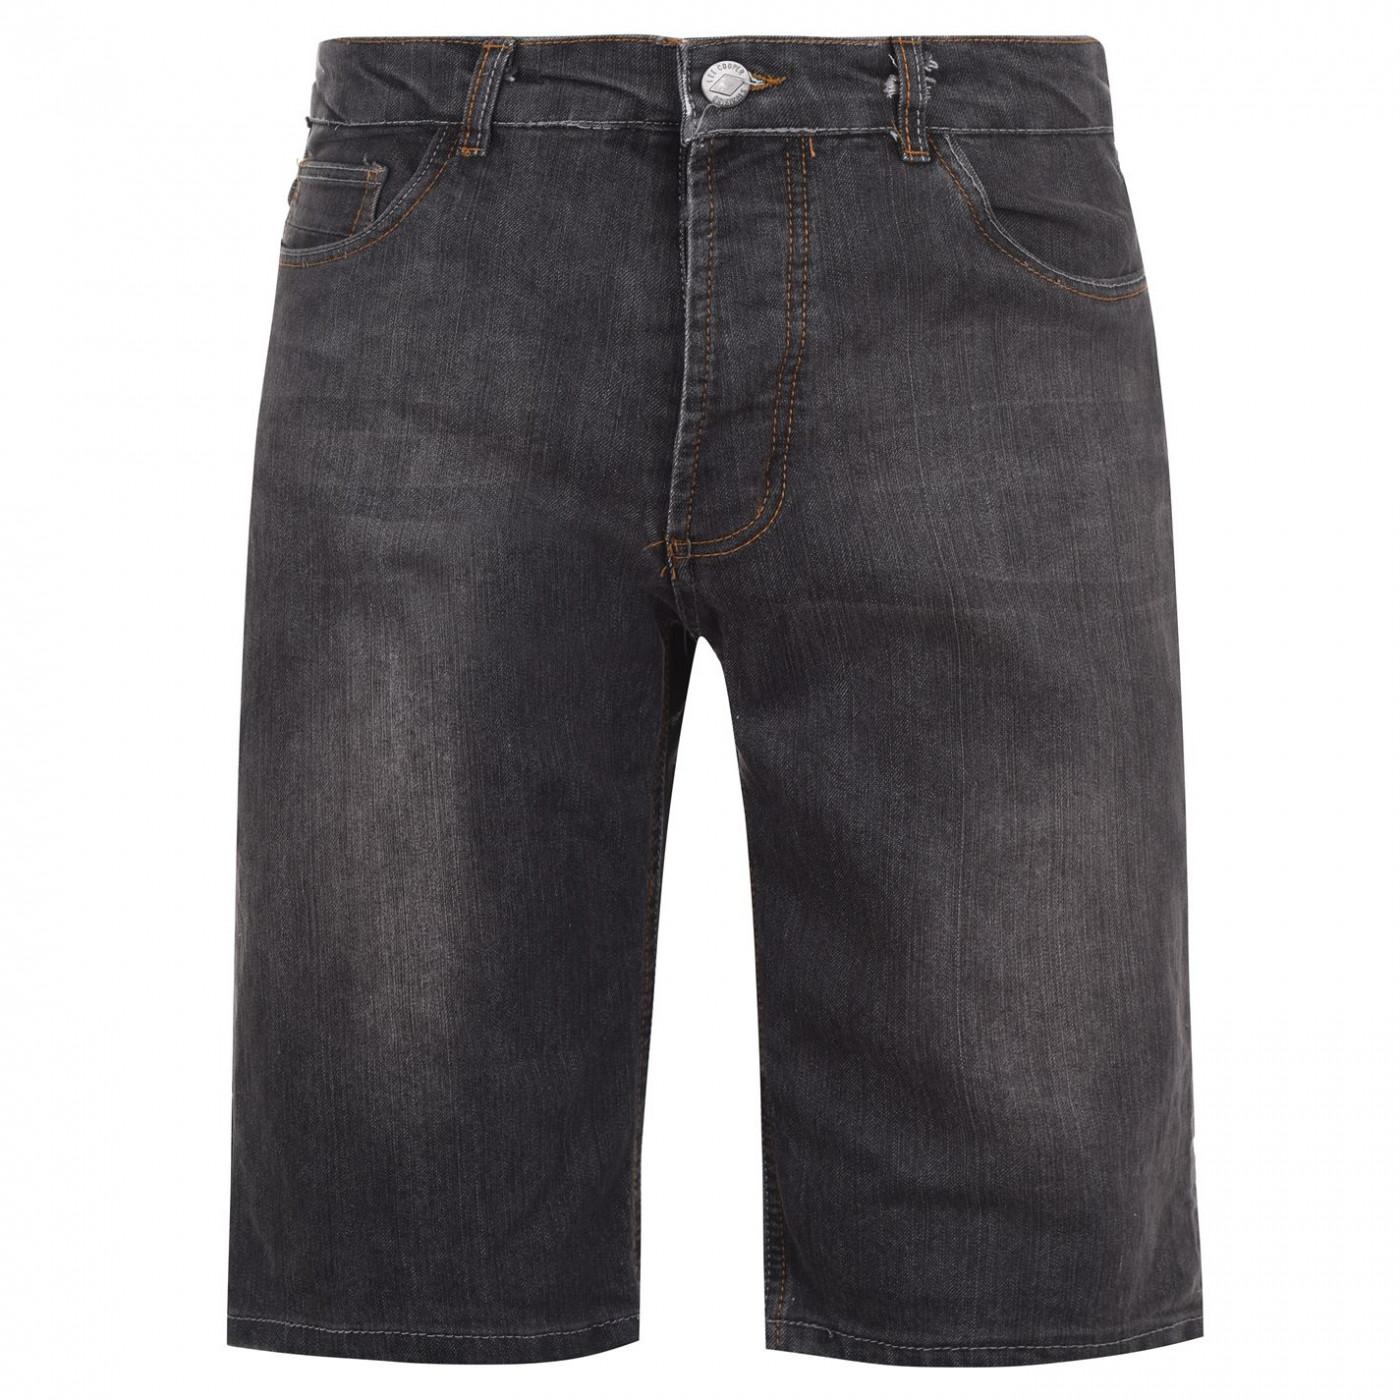 Men's shorts Lee Cooper 64926403